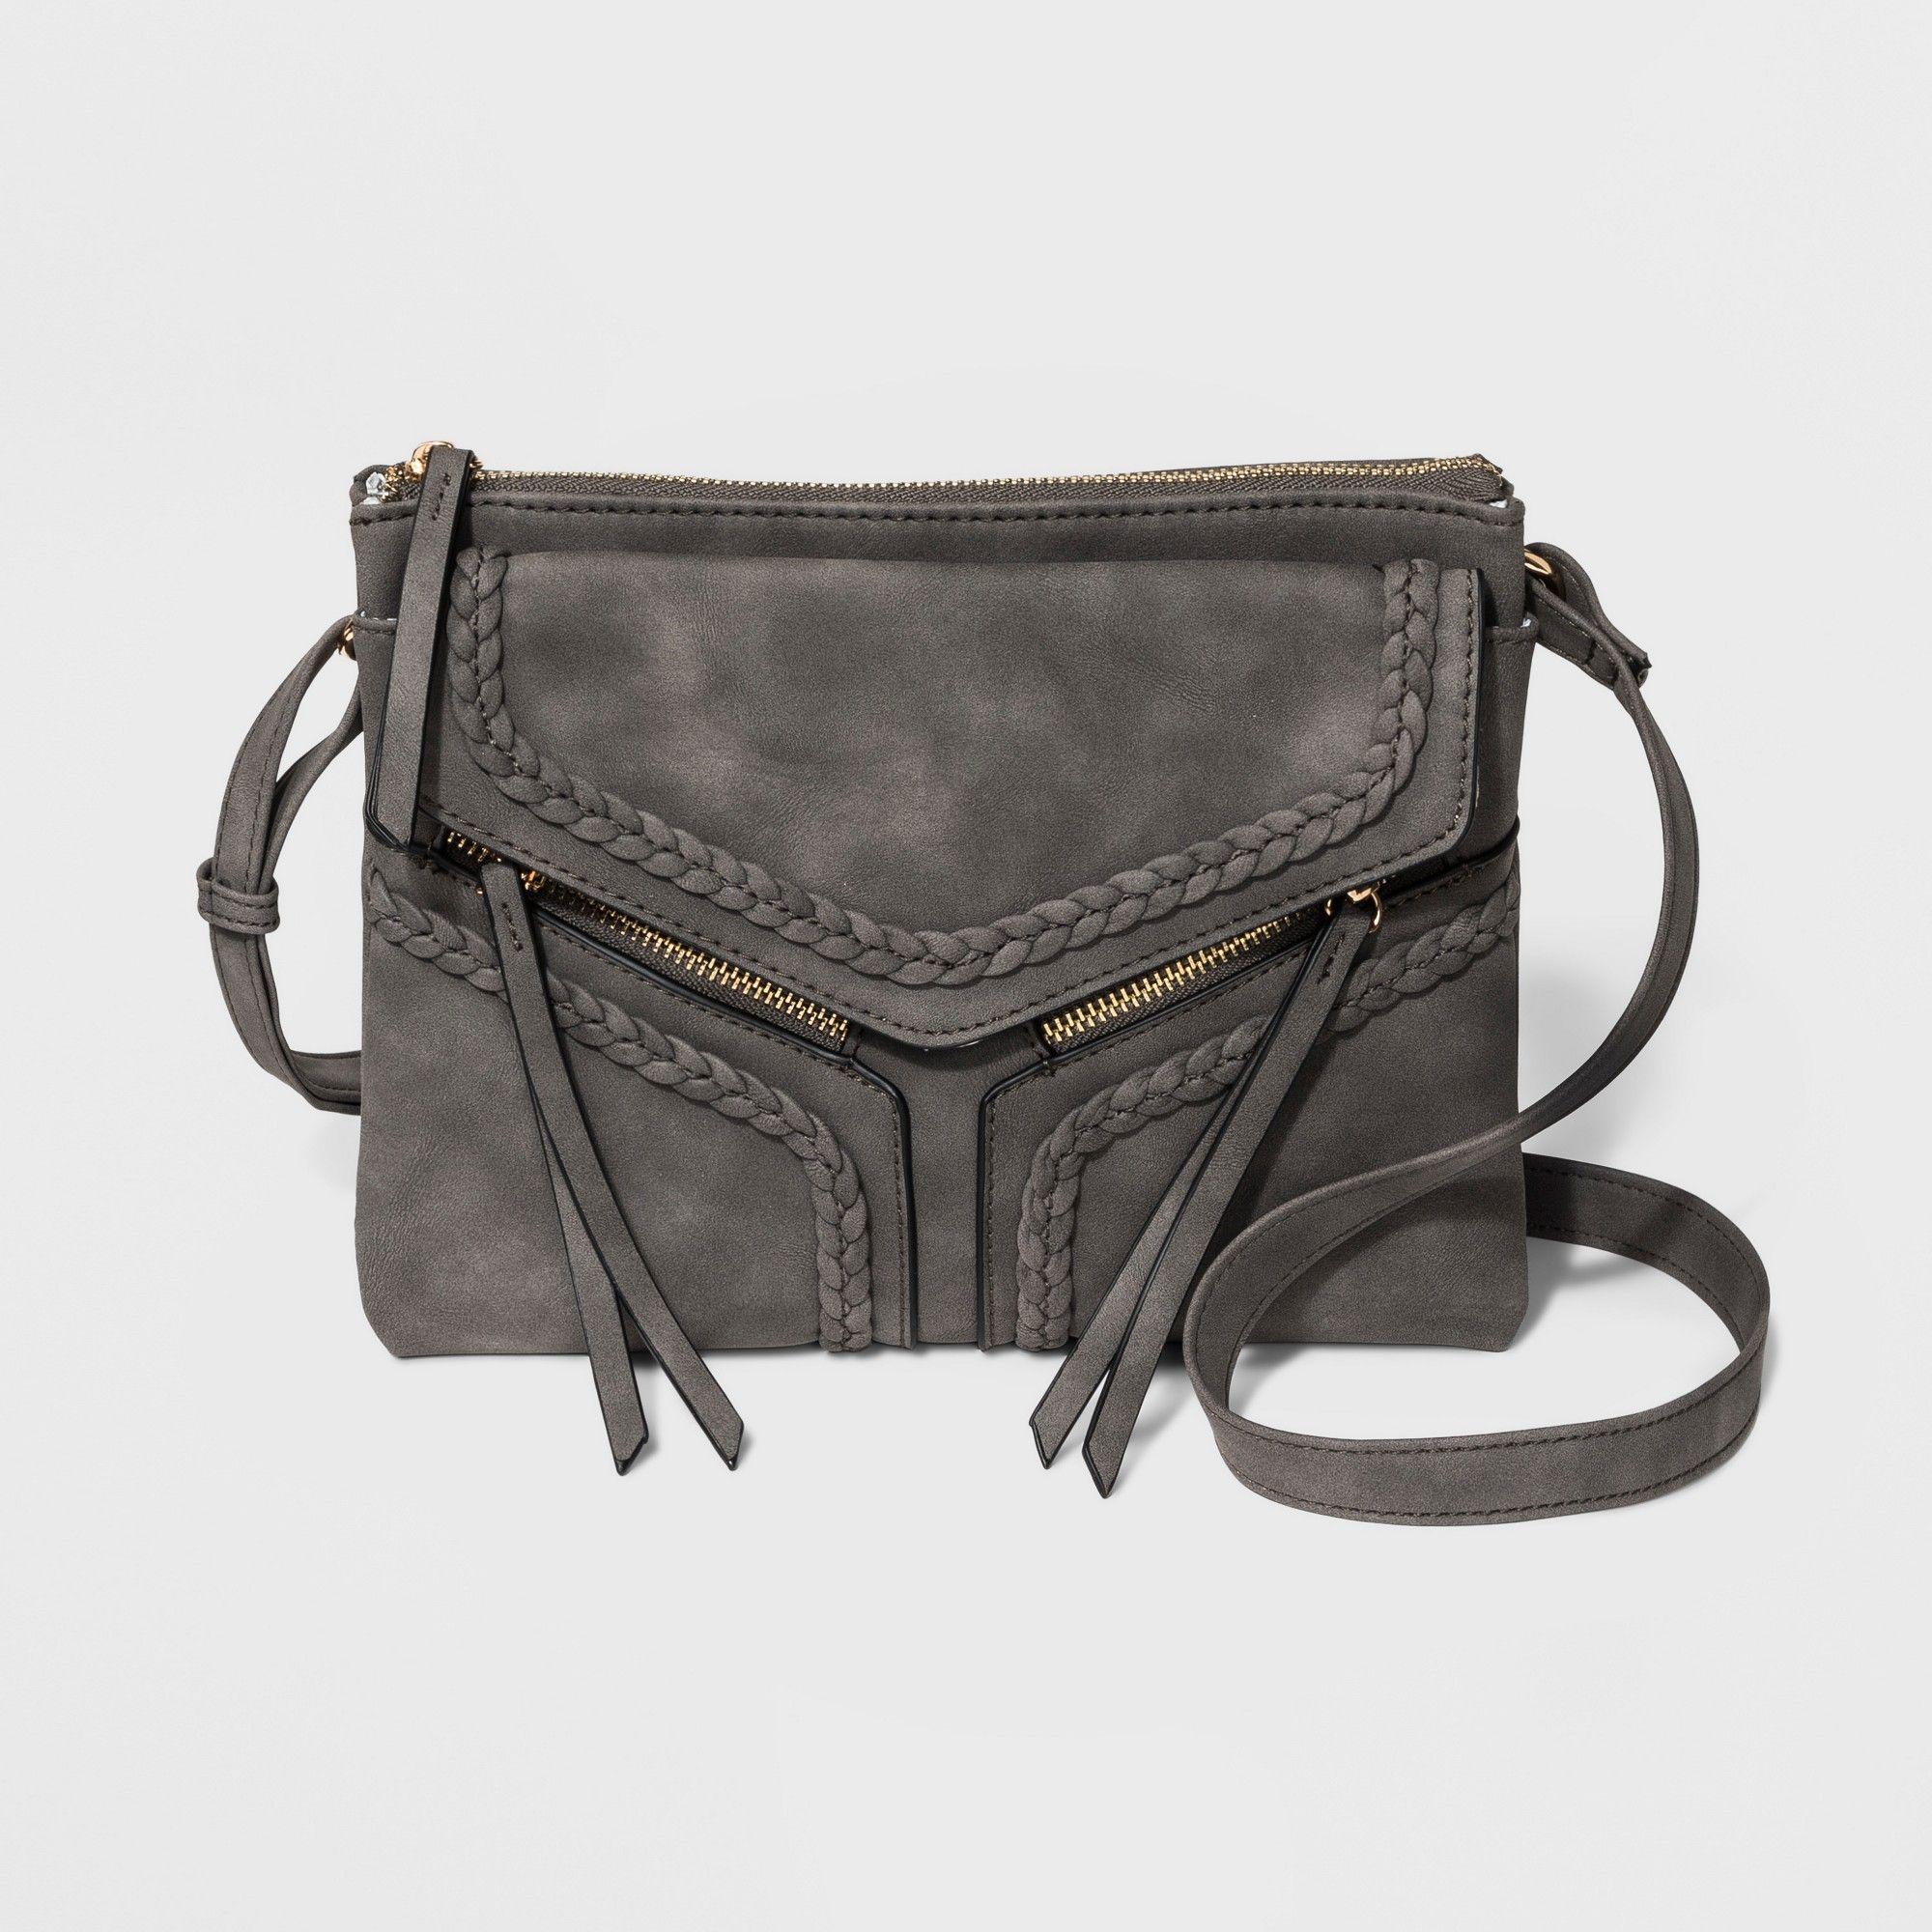 05e877cd3e83 Violet Ray Braided Trims Leanna Crossbody Bag - Gray